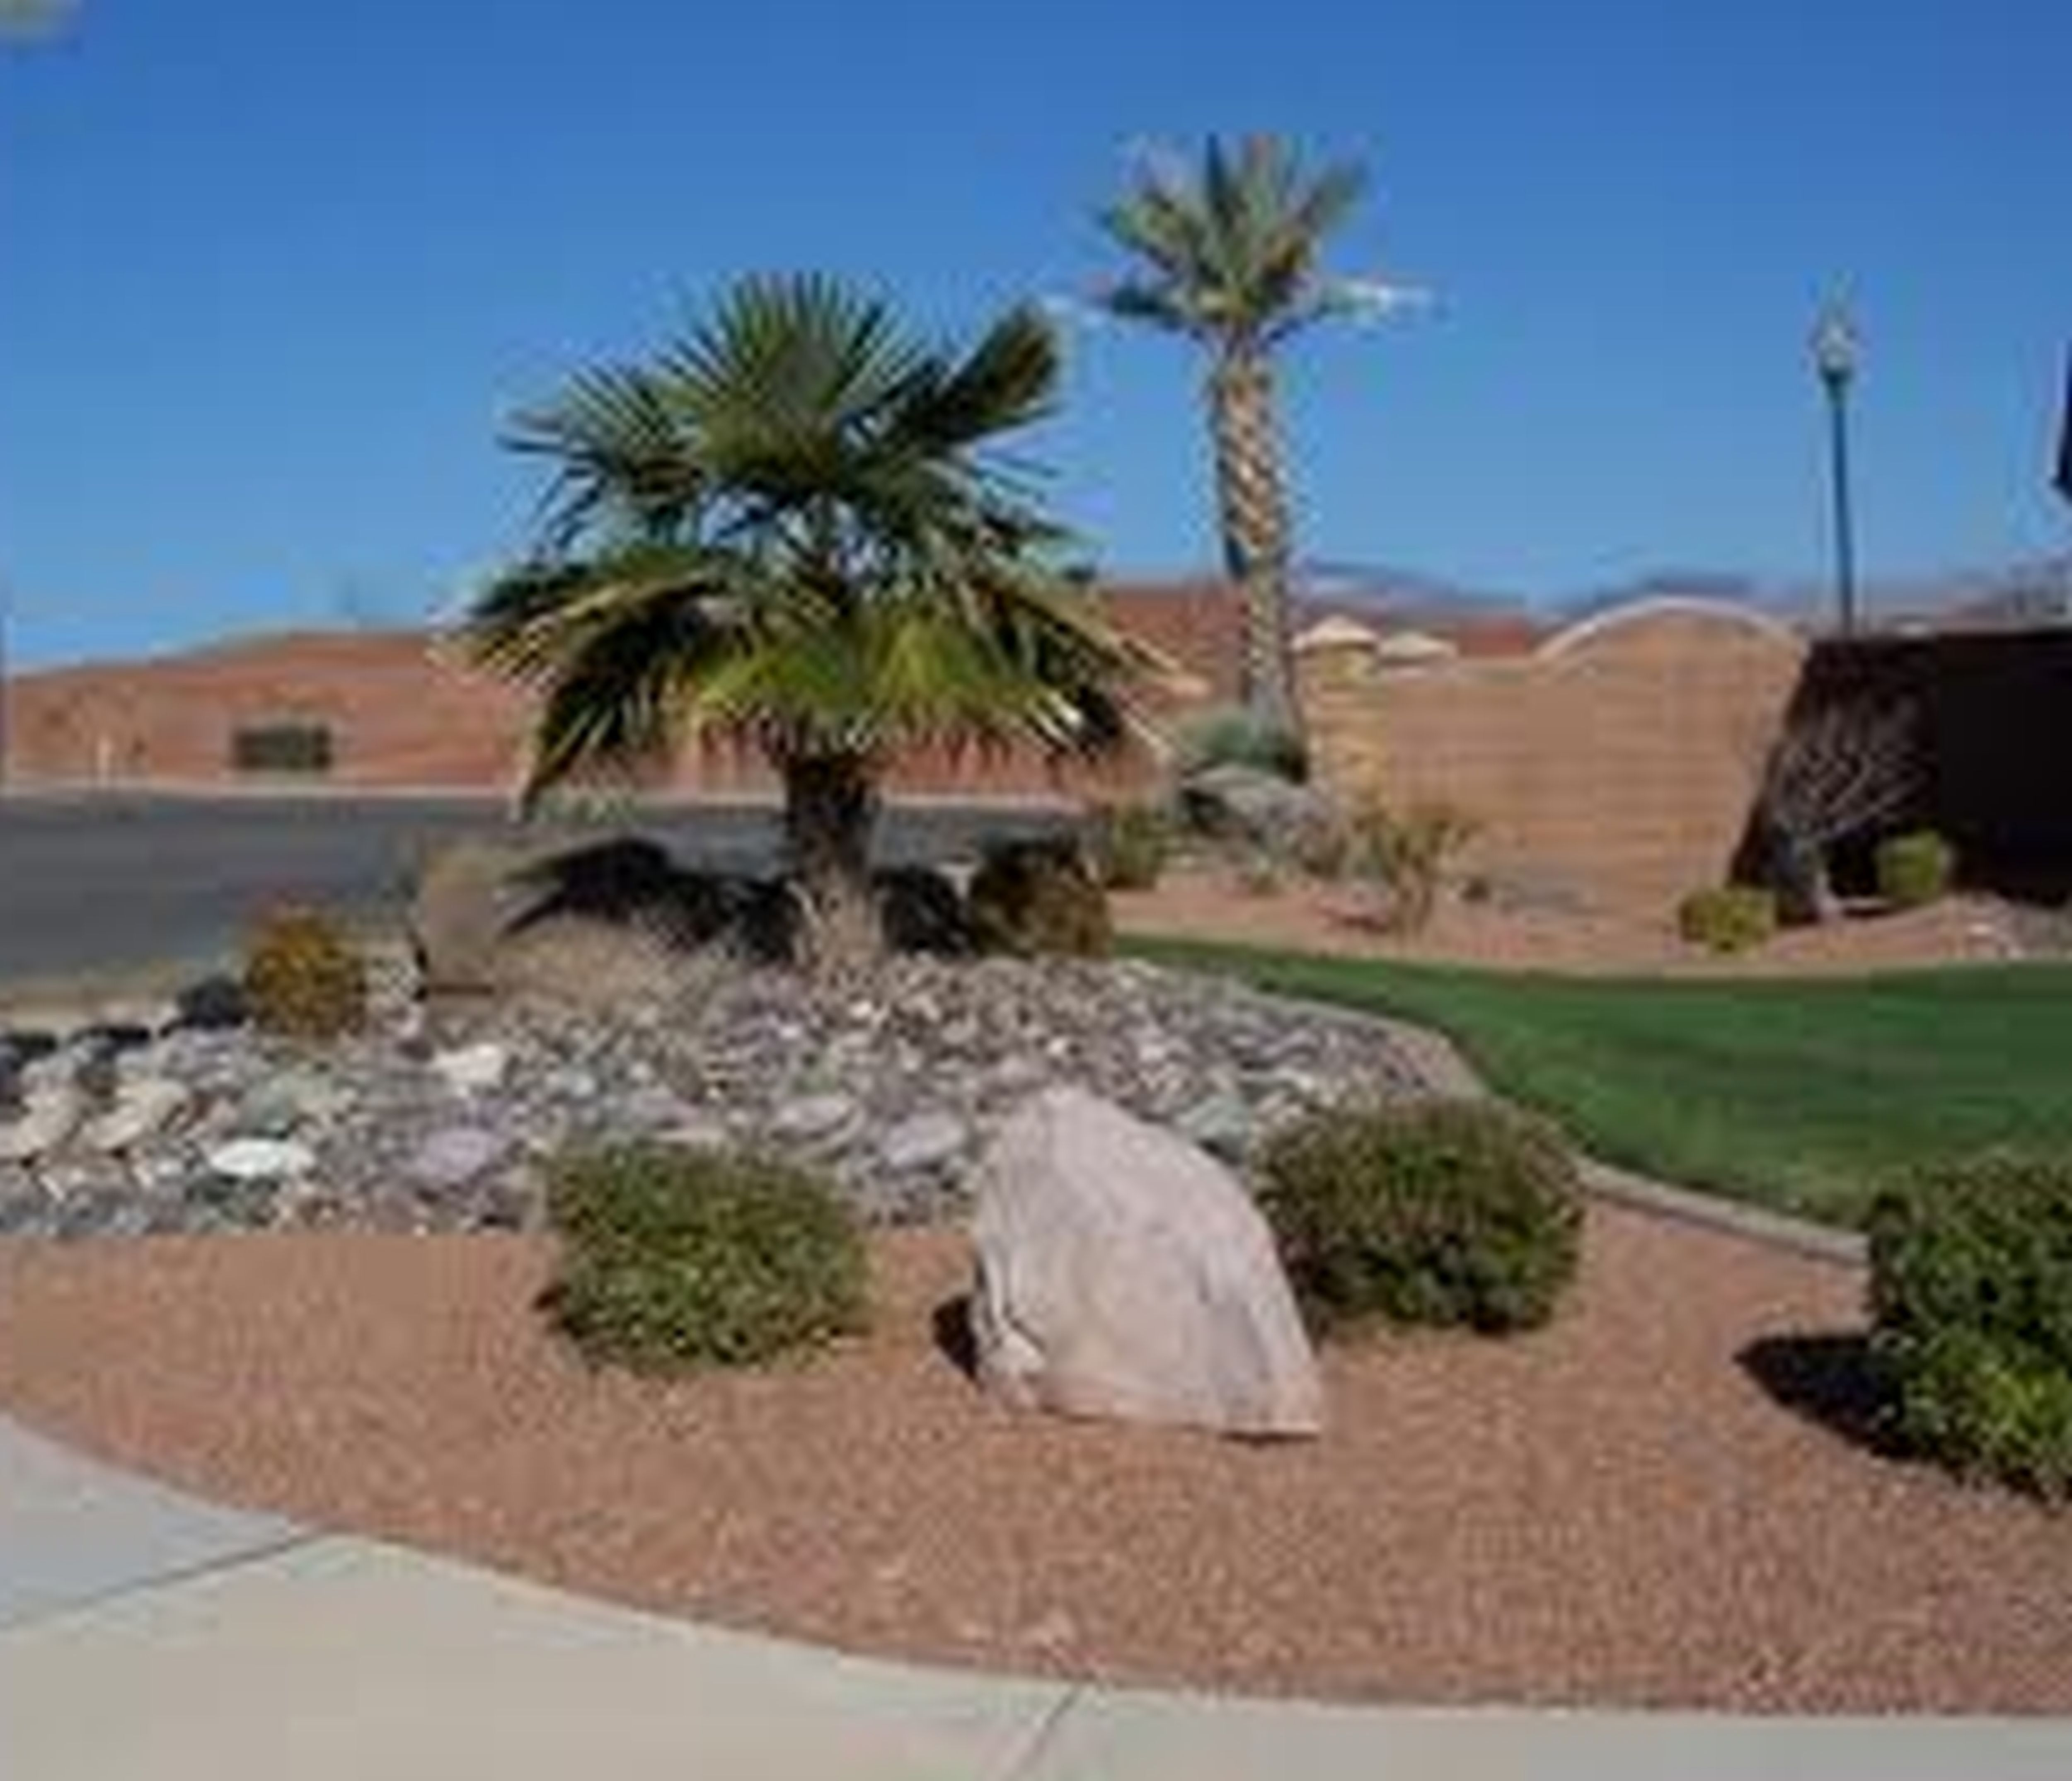 Desert Front Yard Landscaping Ideas Part - 31: Front Yard Desert Landscape Design